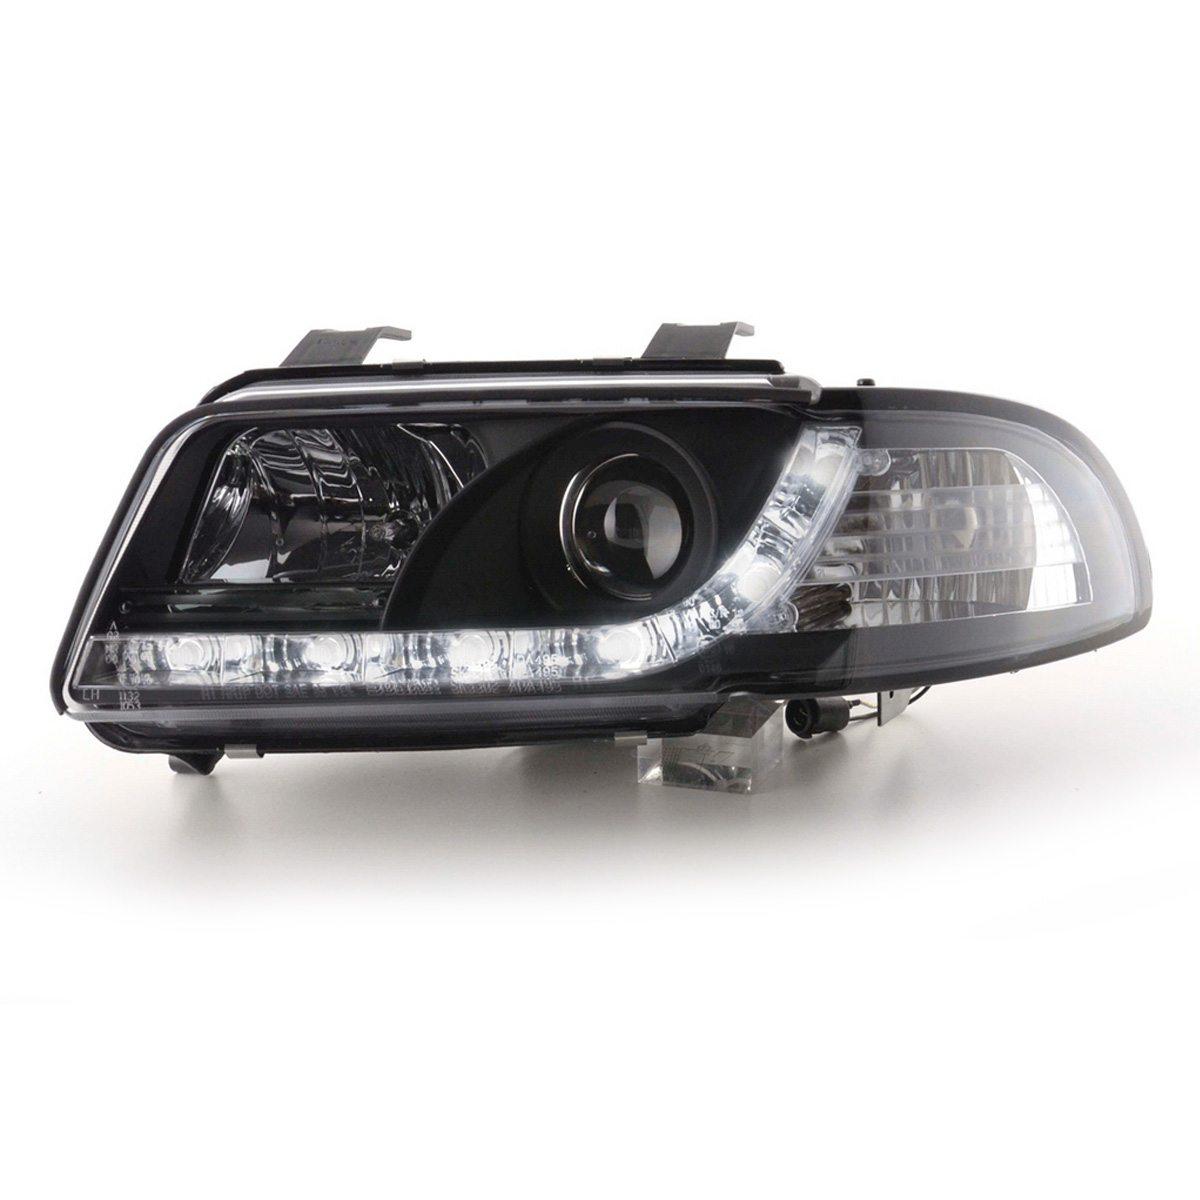 Audi-A4-B5-LimAvant-96-00-Faróis-Angel-Eyes-Dayline-Pretos-2